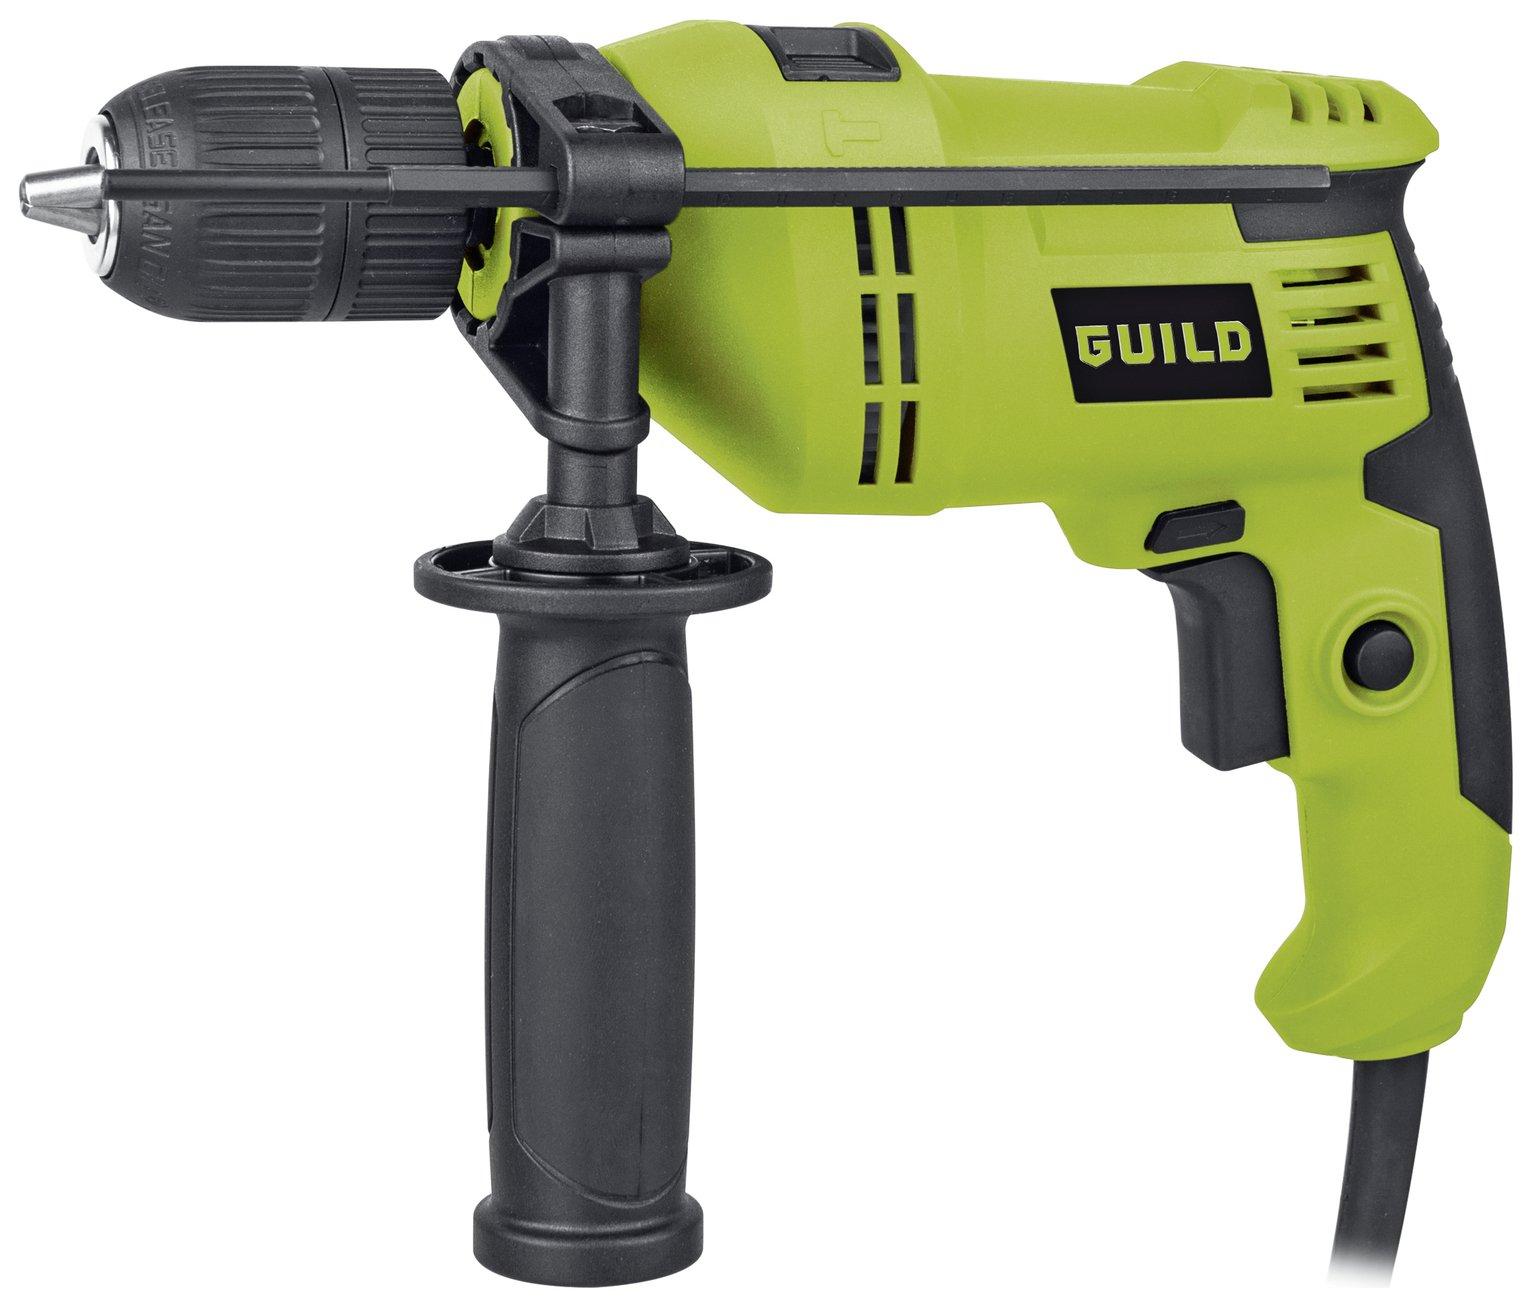 Guild 13mm Keyless Corded Hammer Drill - 600W £23.95 / Rotary Hammer Drill £43.95 / Sander £23.95 + more + 2 year guarantee @ Argos